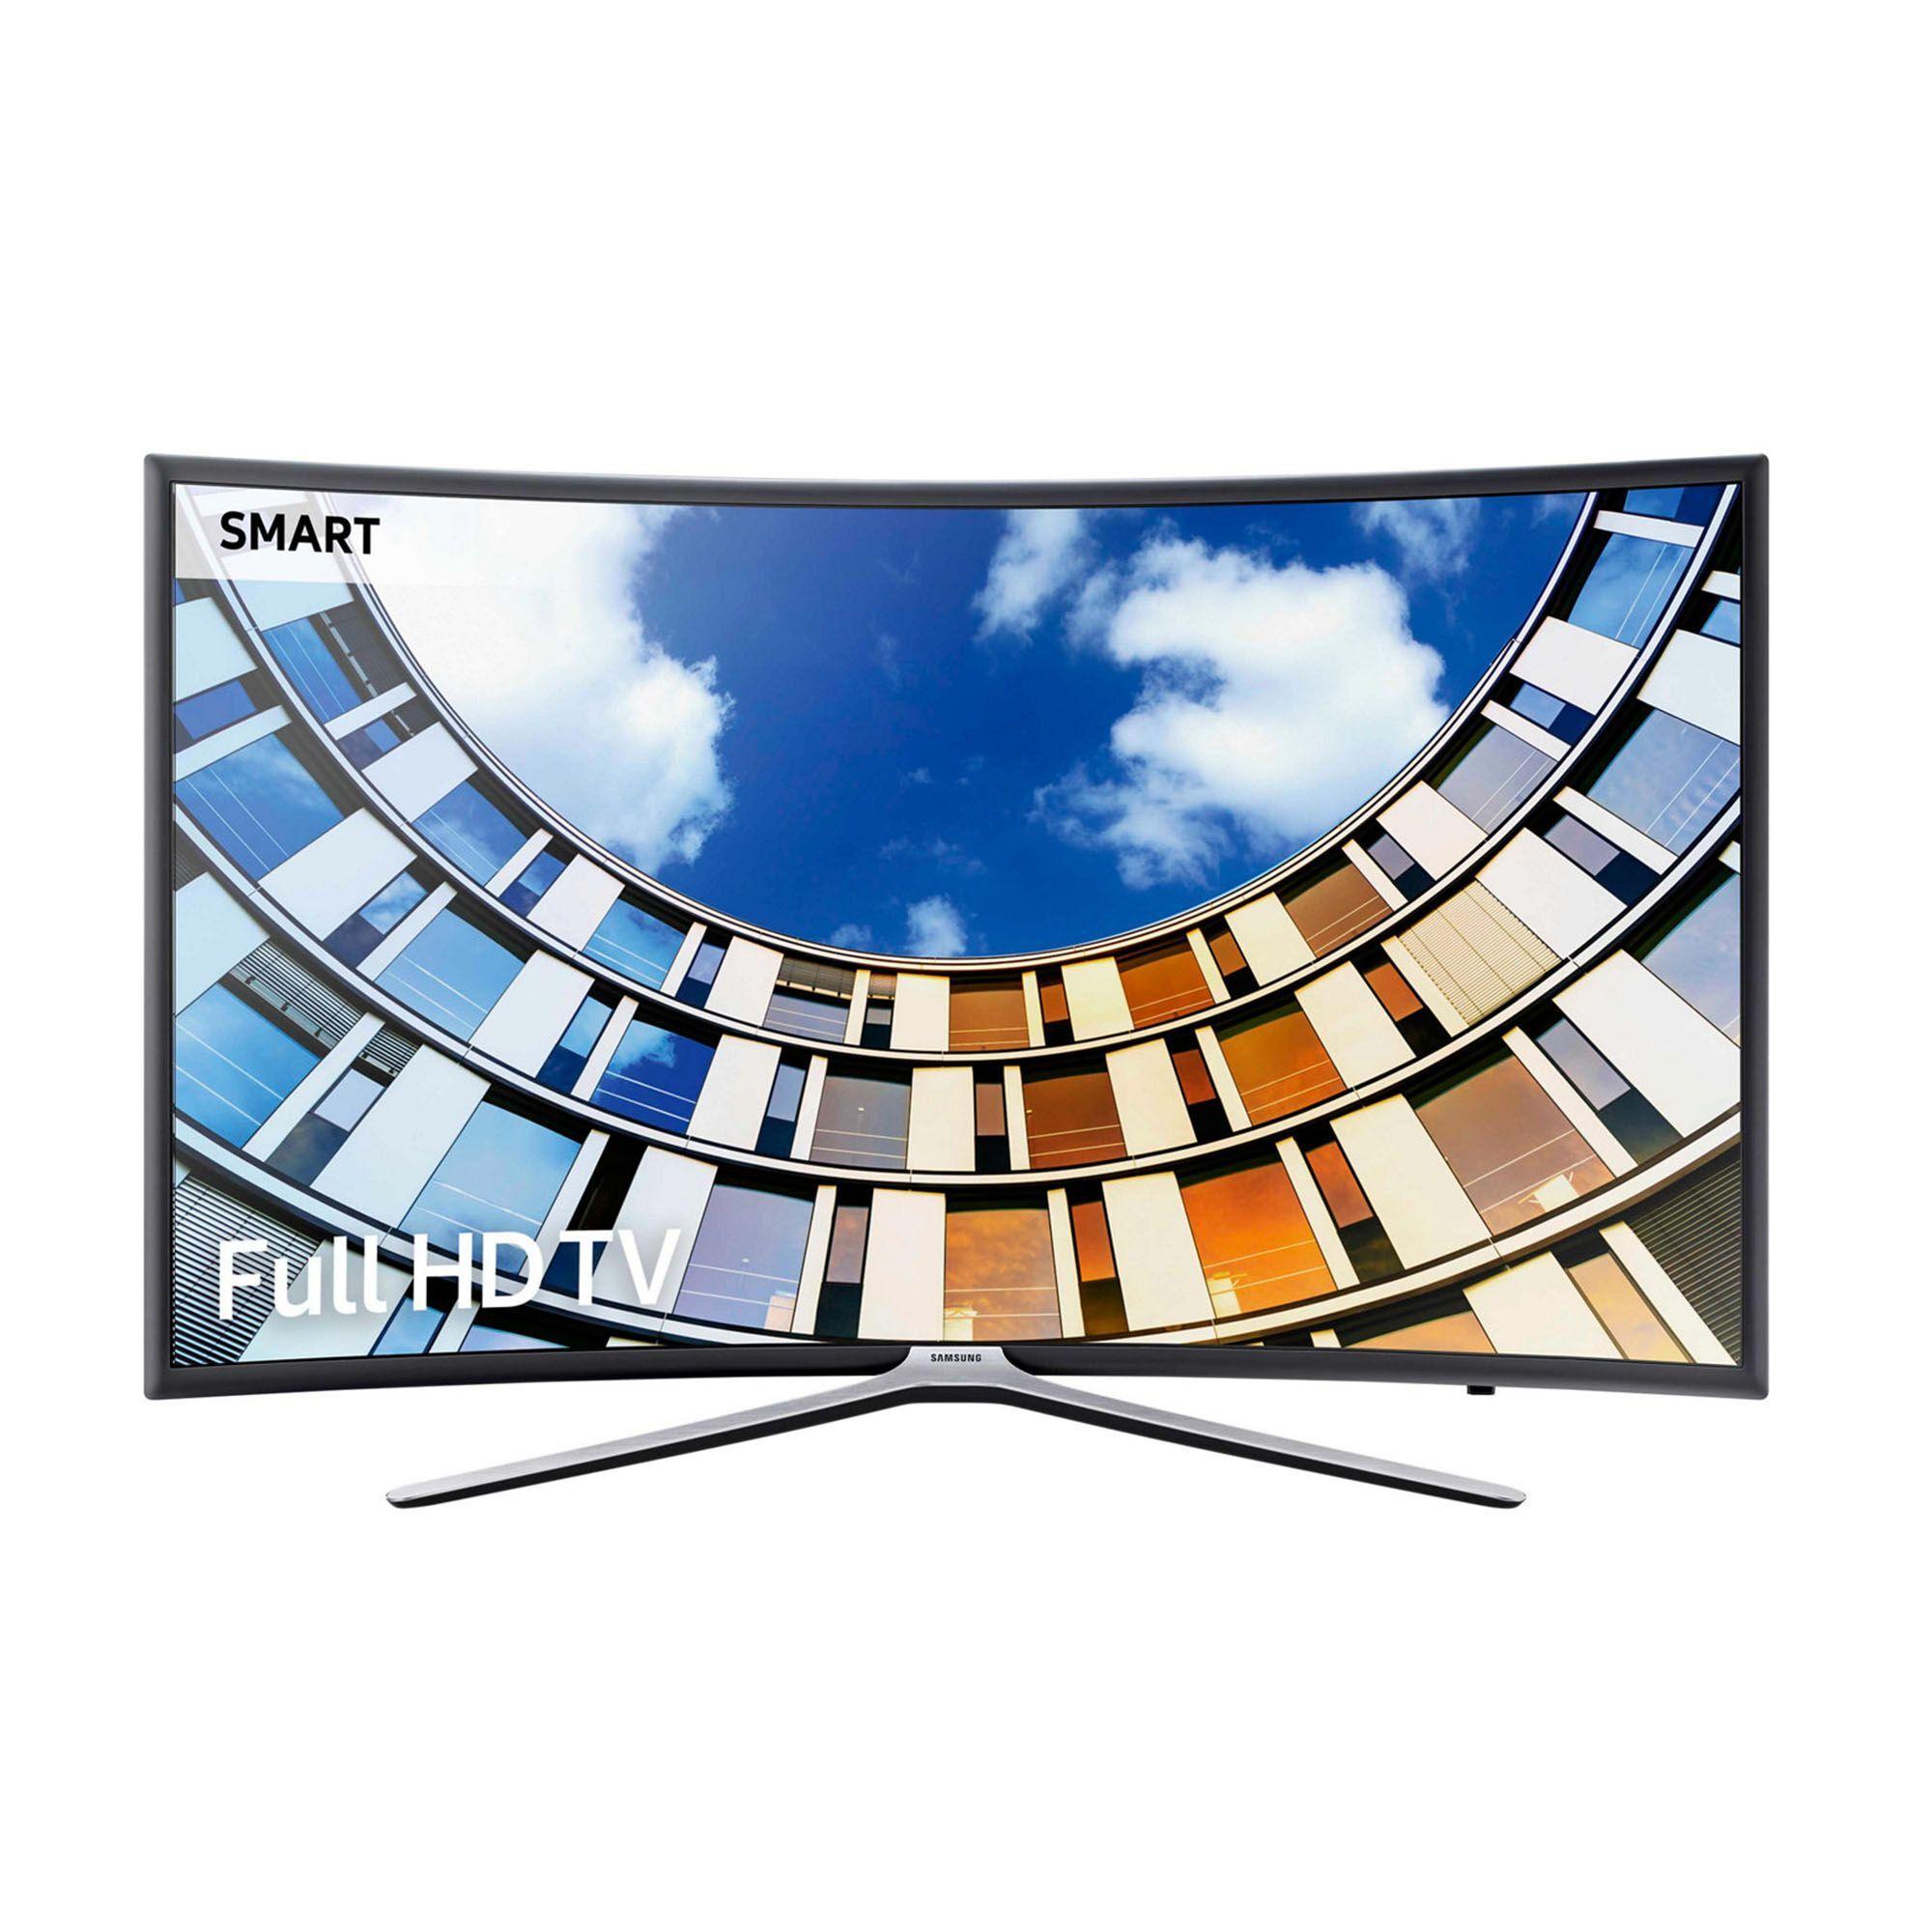 Samsung 55M6320 TV LED Full HD 55